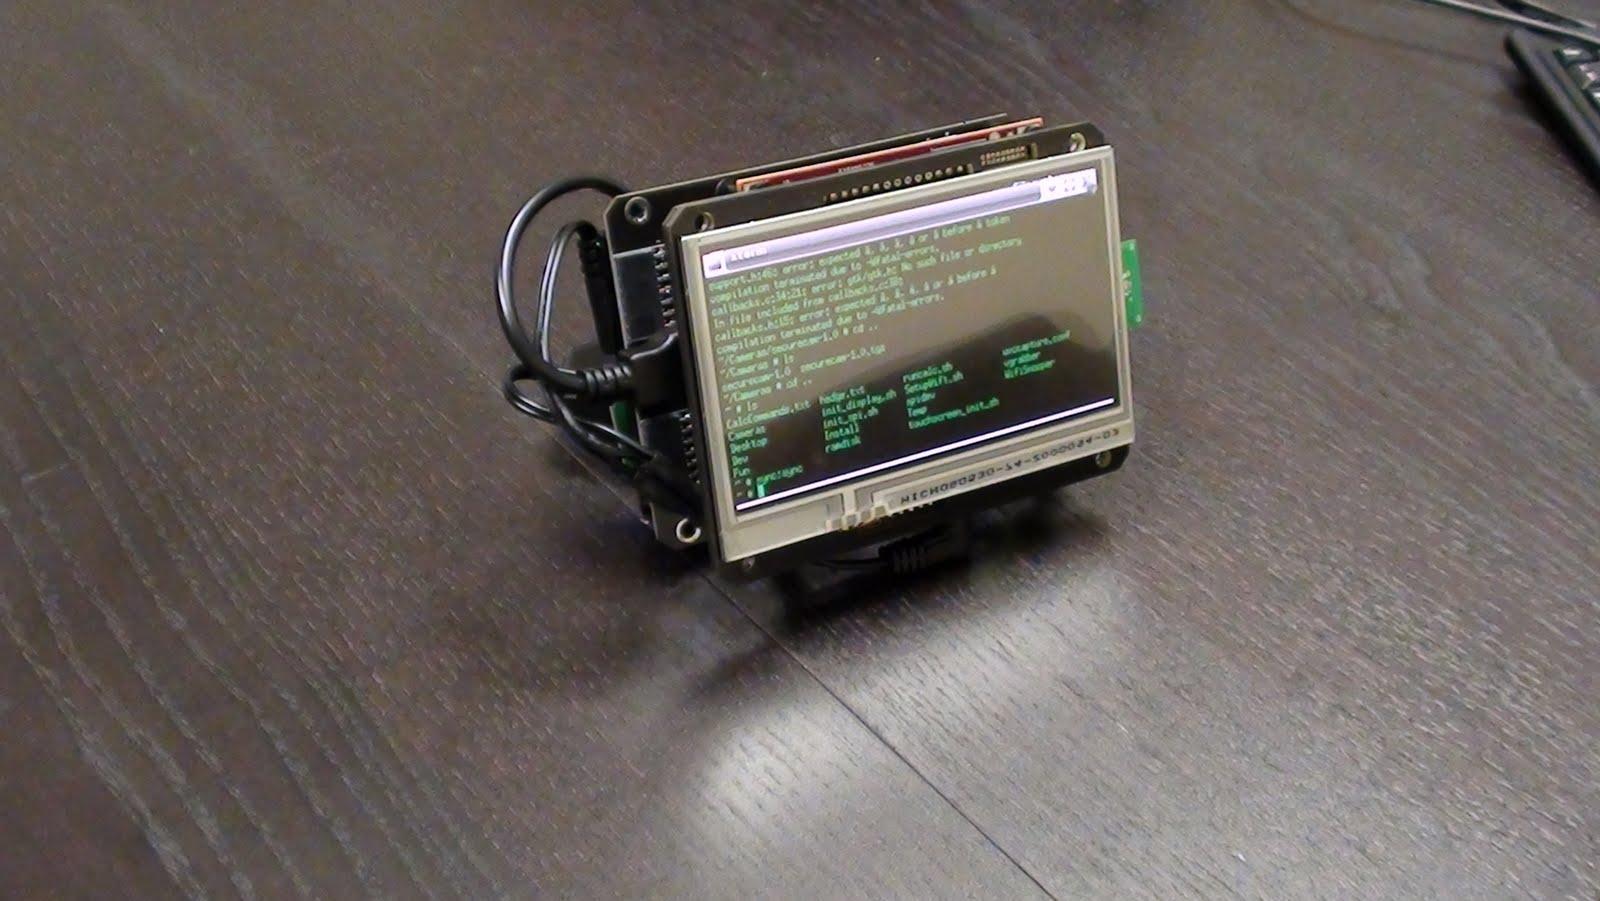 BeagleBoard Modular Gadget Angled Shot